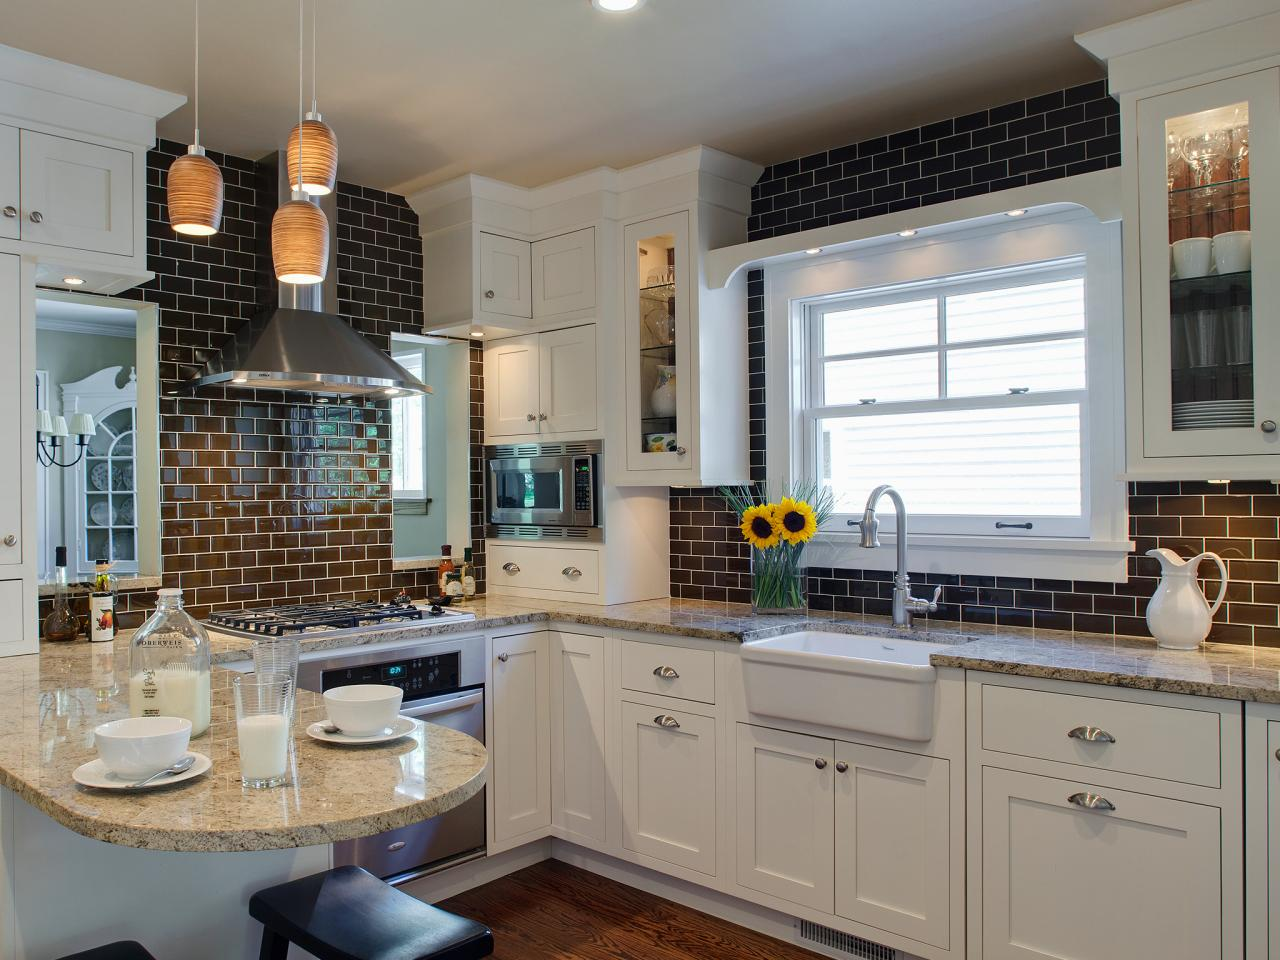 stone honed marble - Tile Kitchen Backsplash